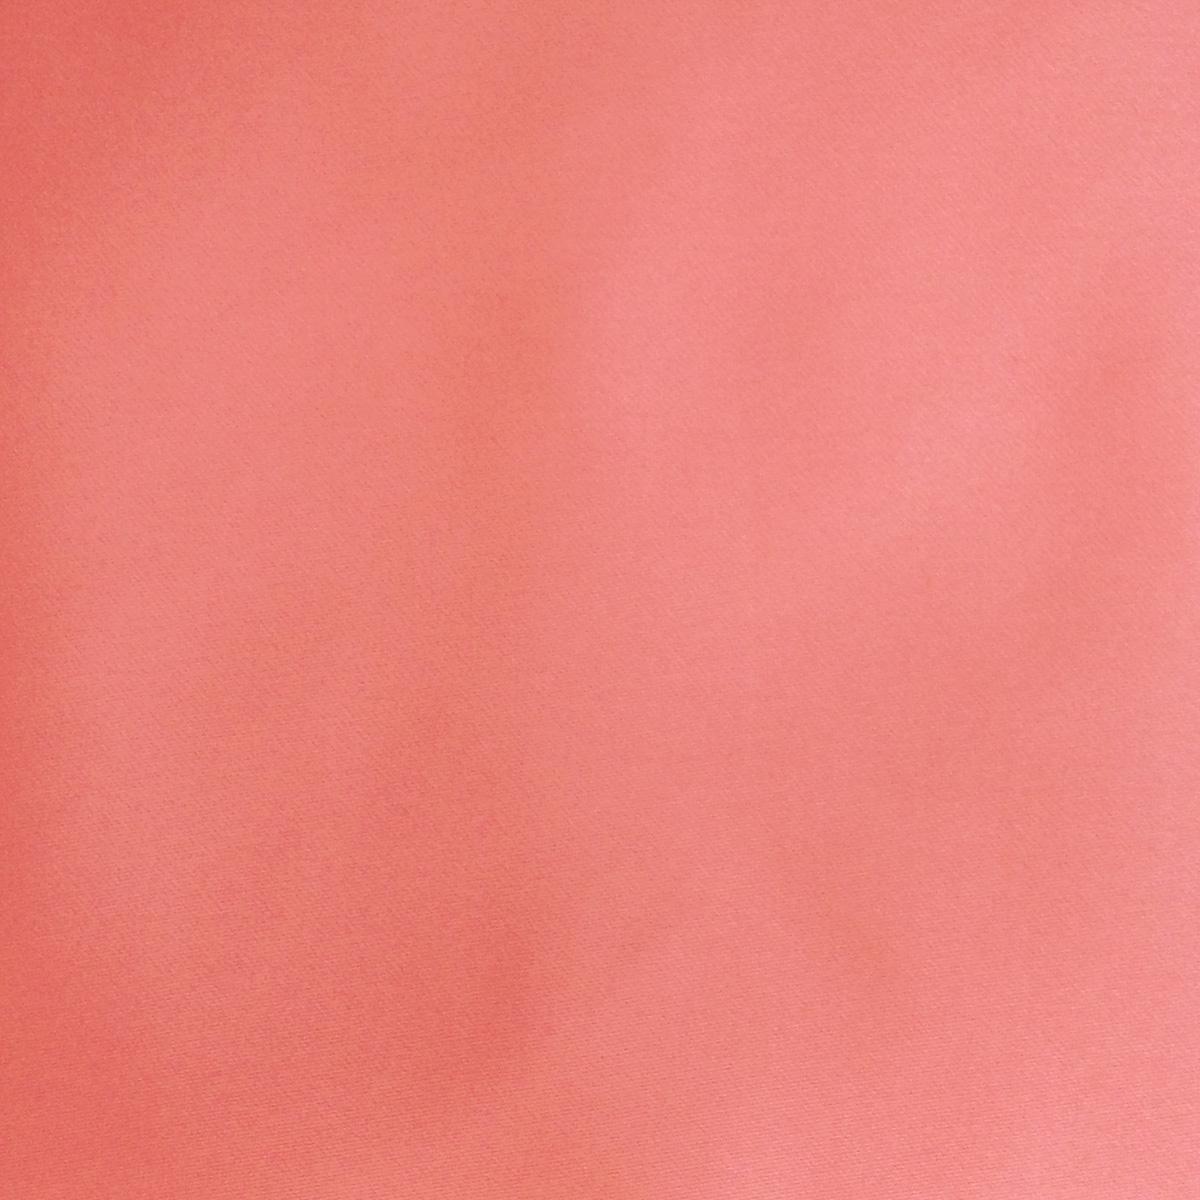 B1764 18 coral mens ties facemasks con murphys menswear cork - - Con Murphys Menswear